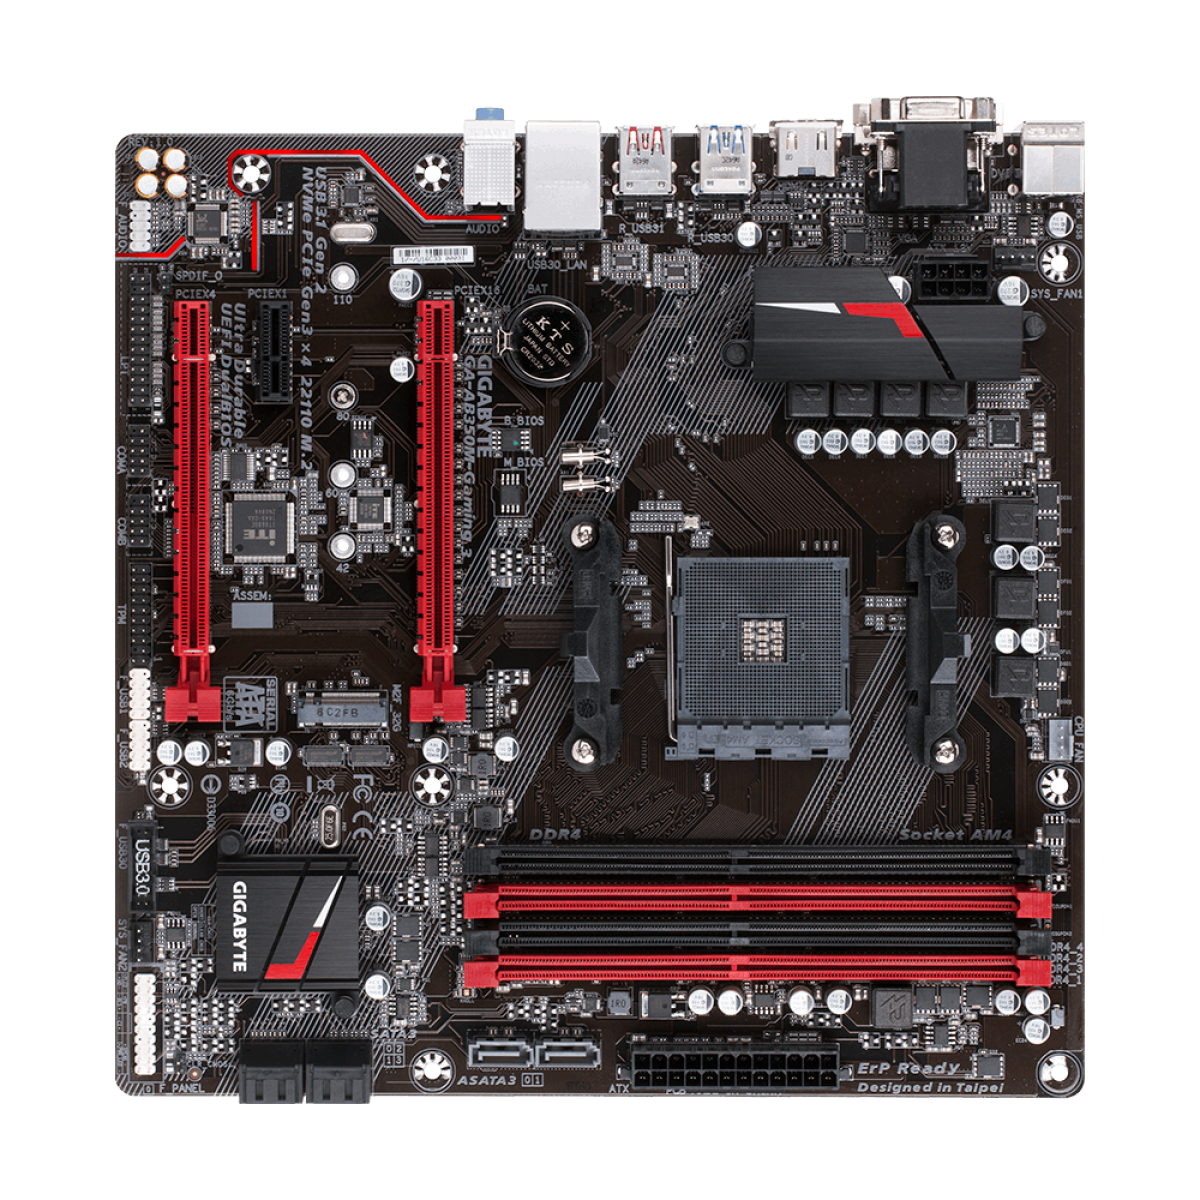 Placa Mãe Gigabyte GA-AB350M-GAMING 3, Chipset B350, AMD AM4, mATX, DDR4